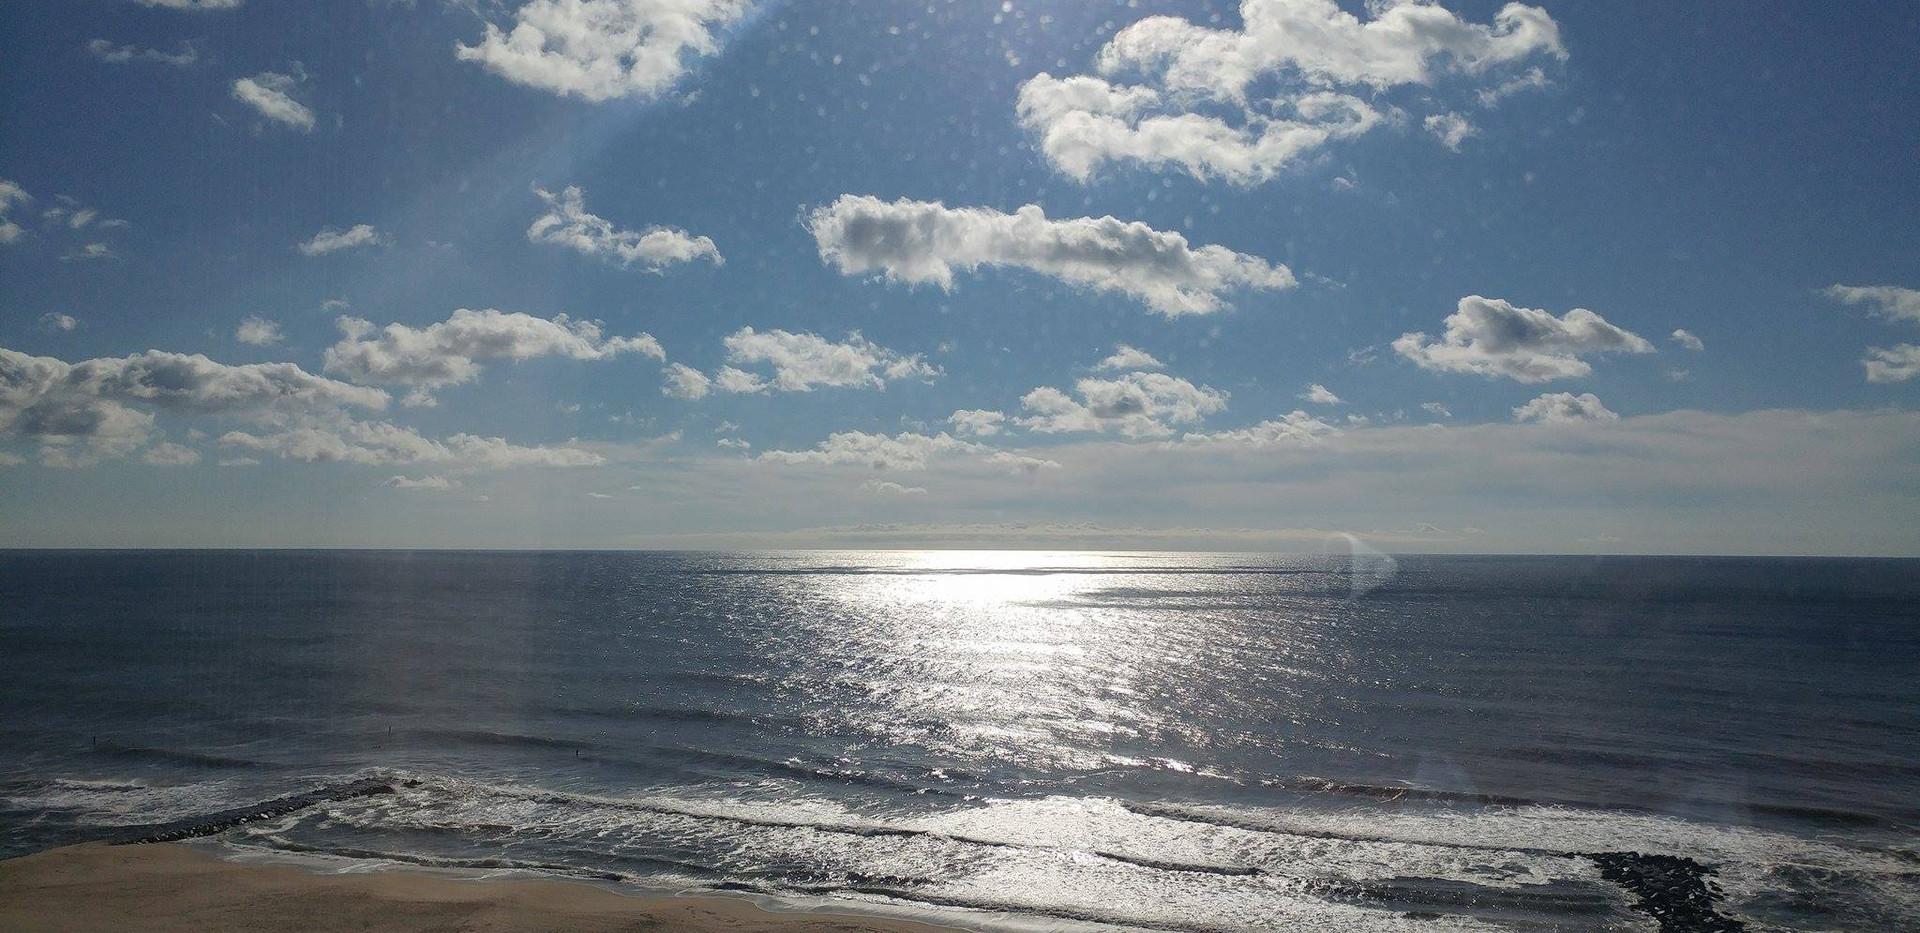 Jersey Shore and Atlantic Ocean